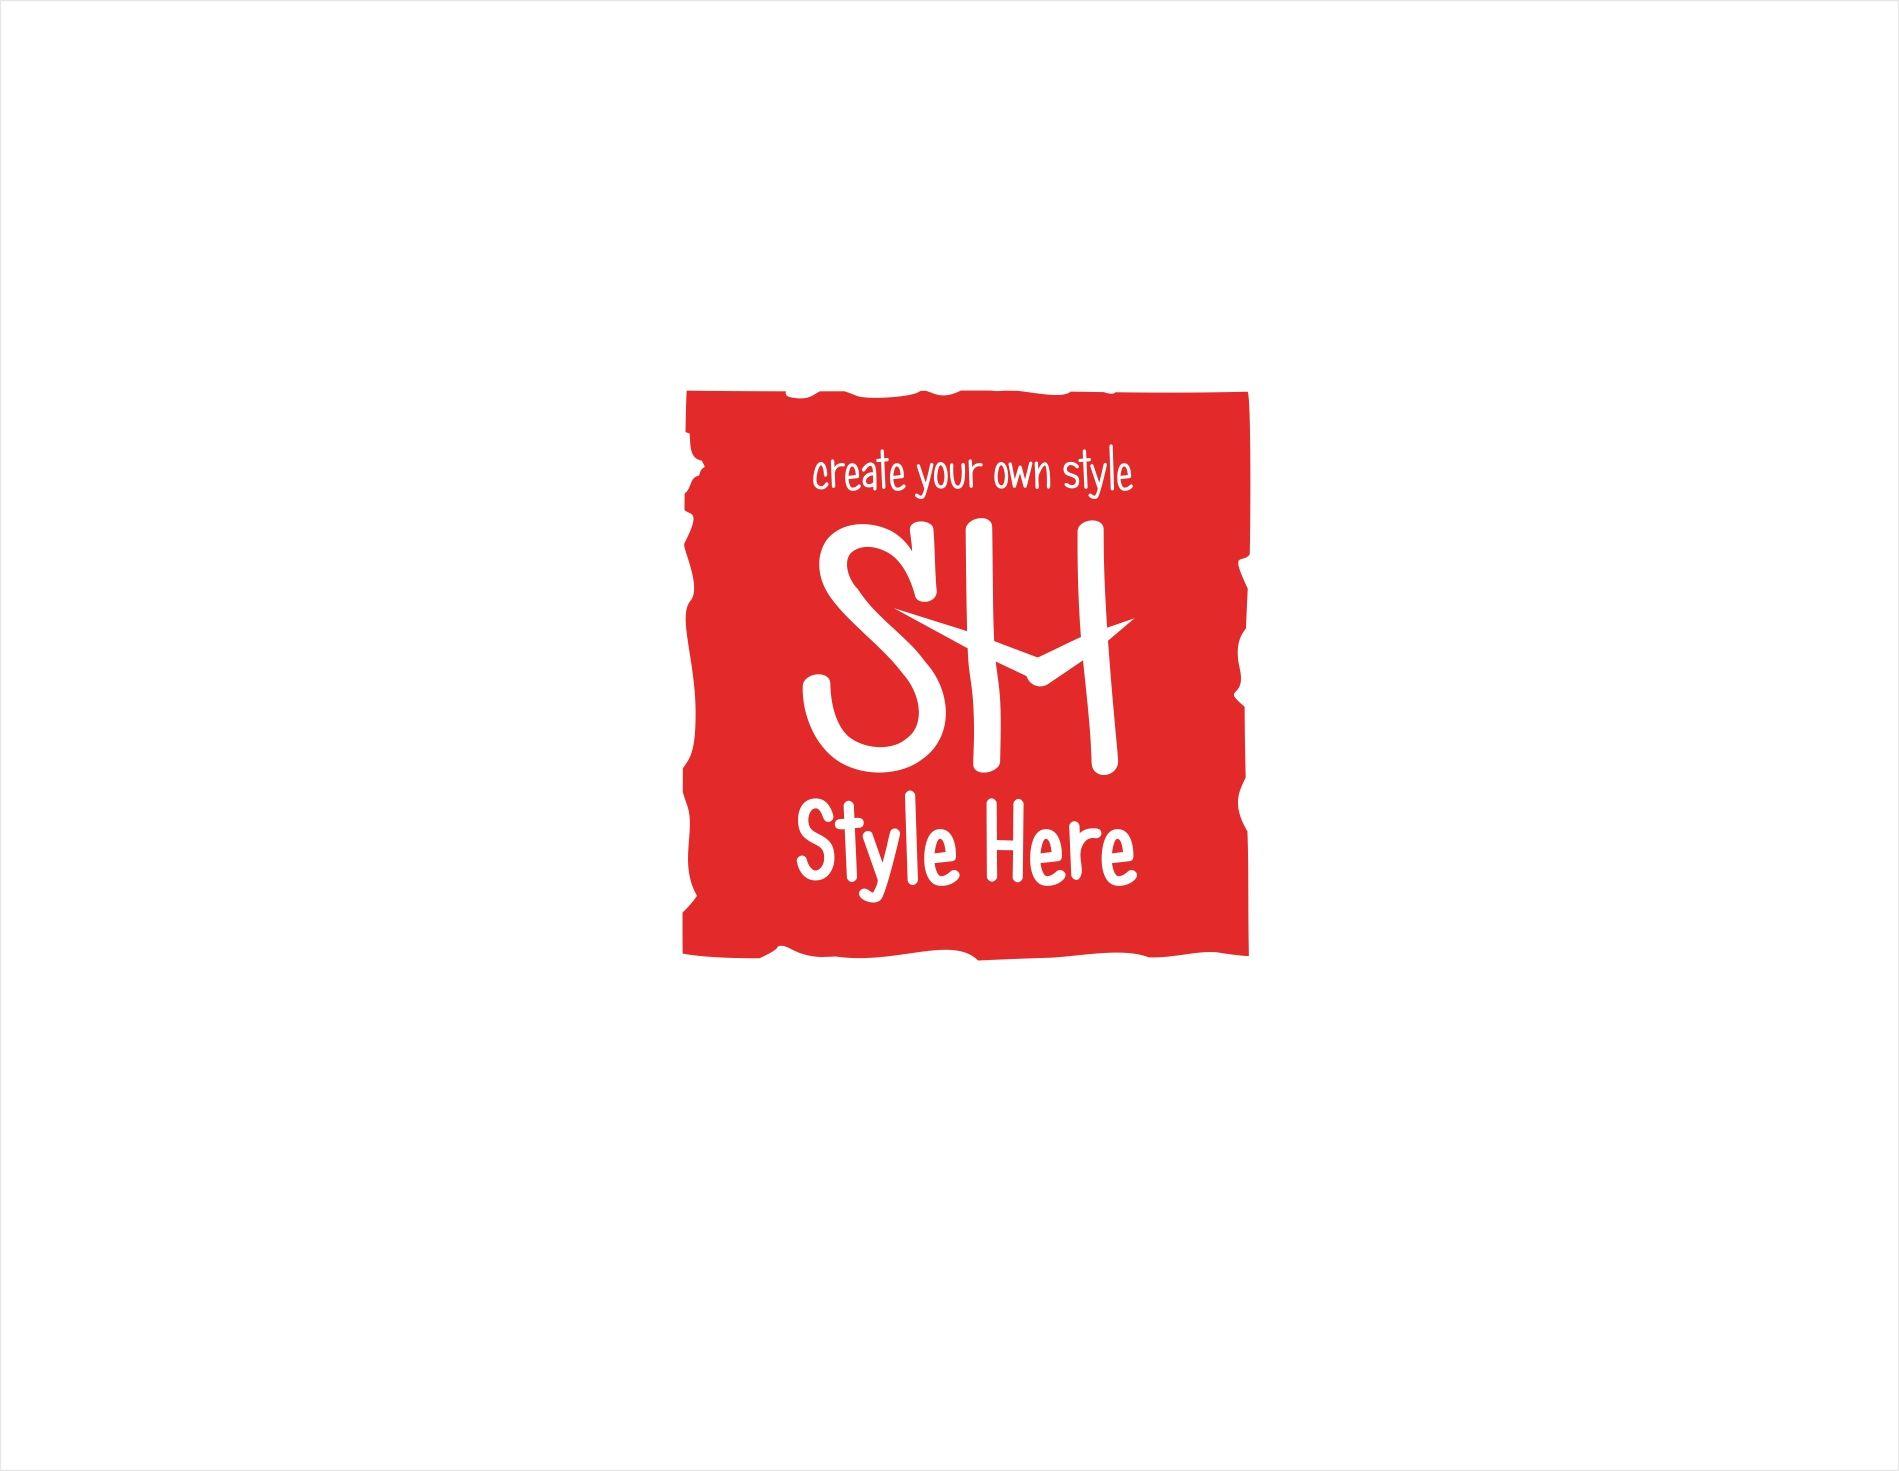 Логотип для интернет-магазина stylehere.ru - дизайнер kras-sky